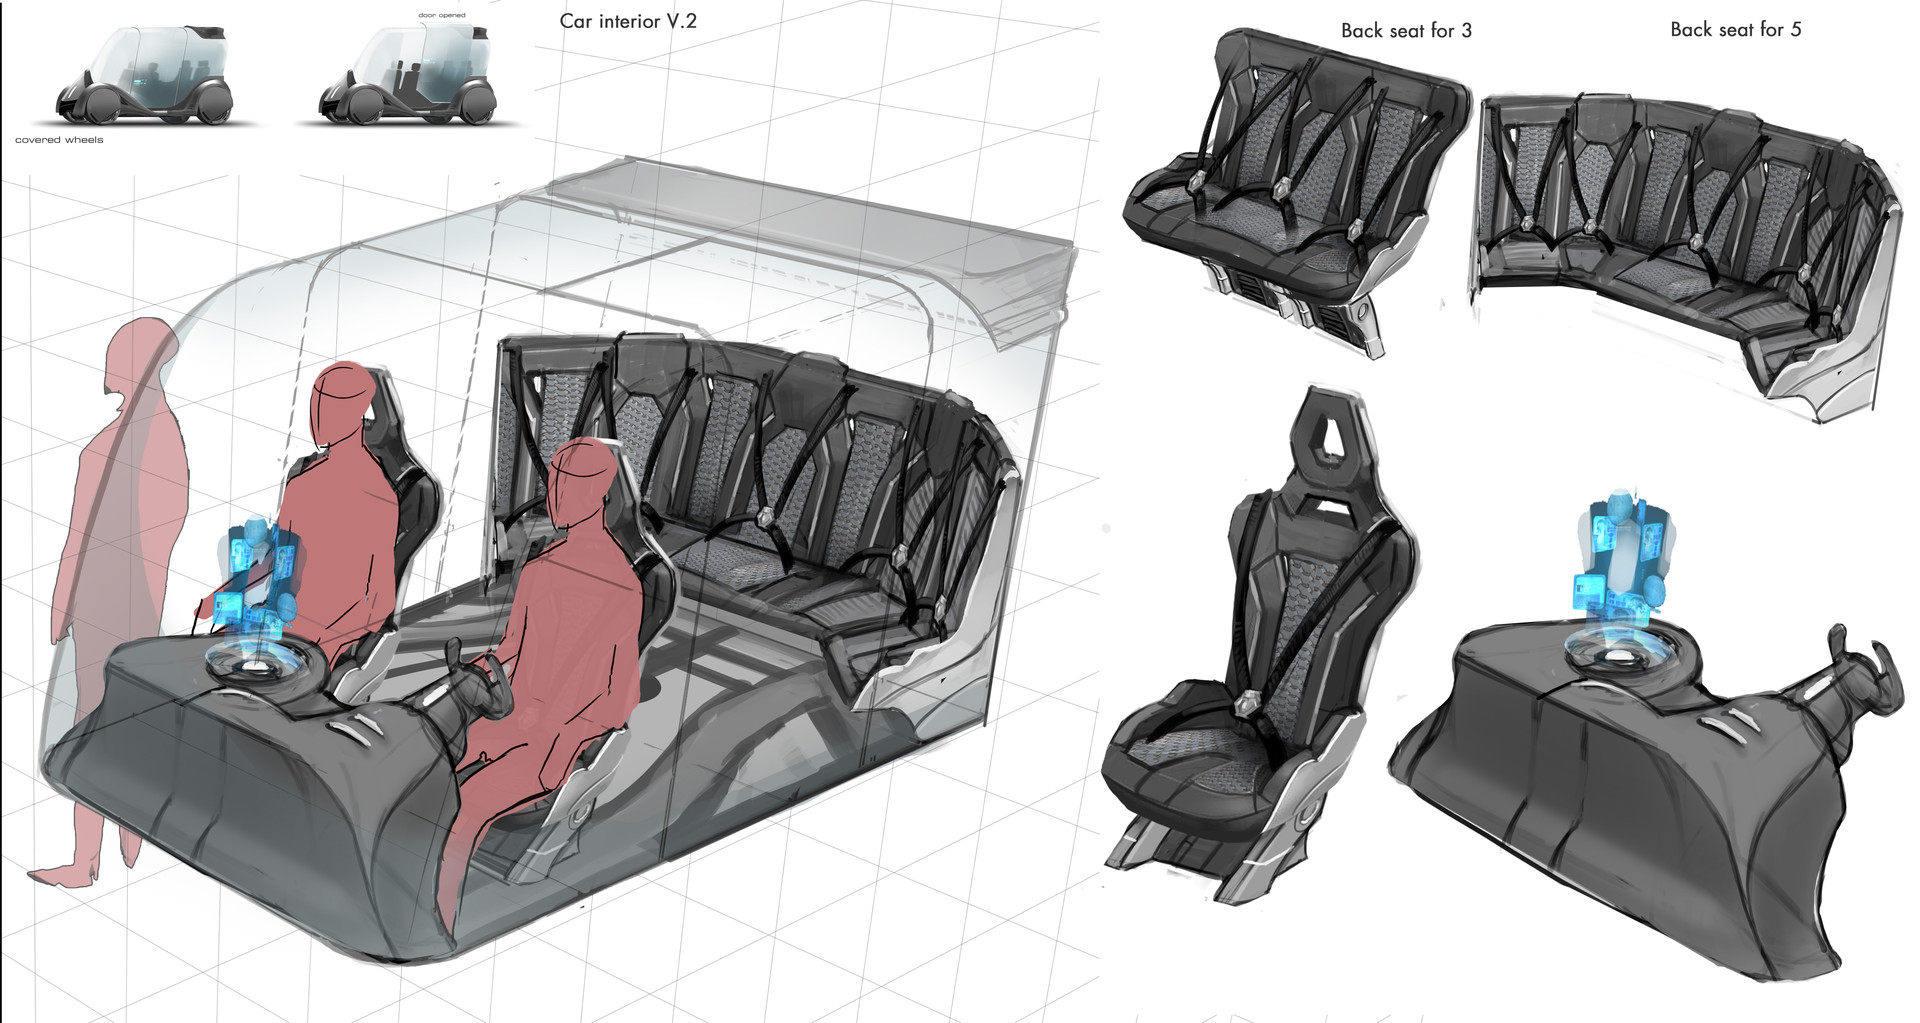 Nothof ferenc car interior v2